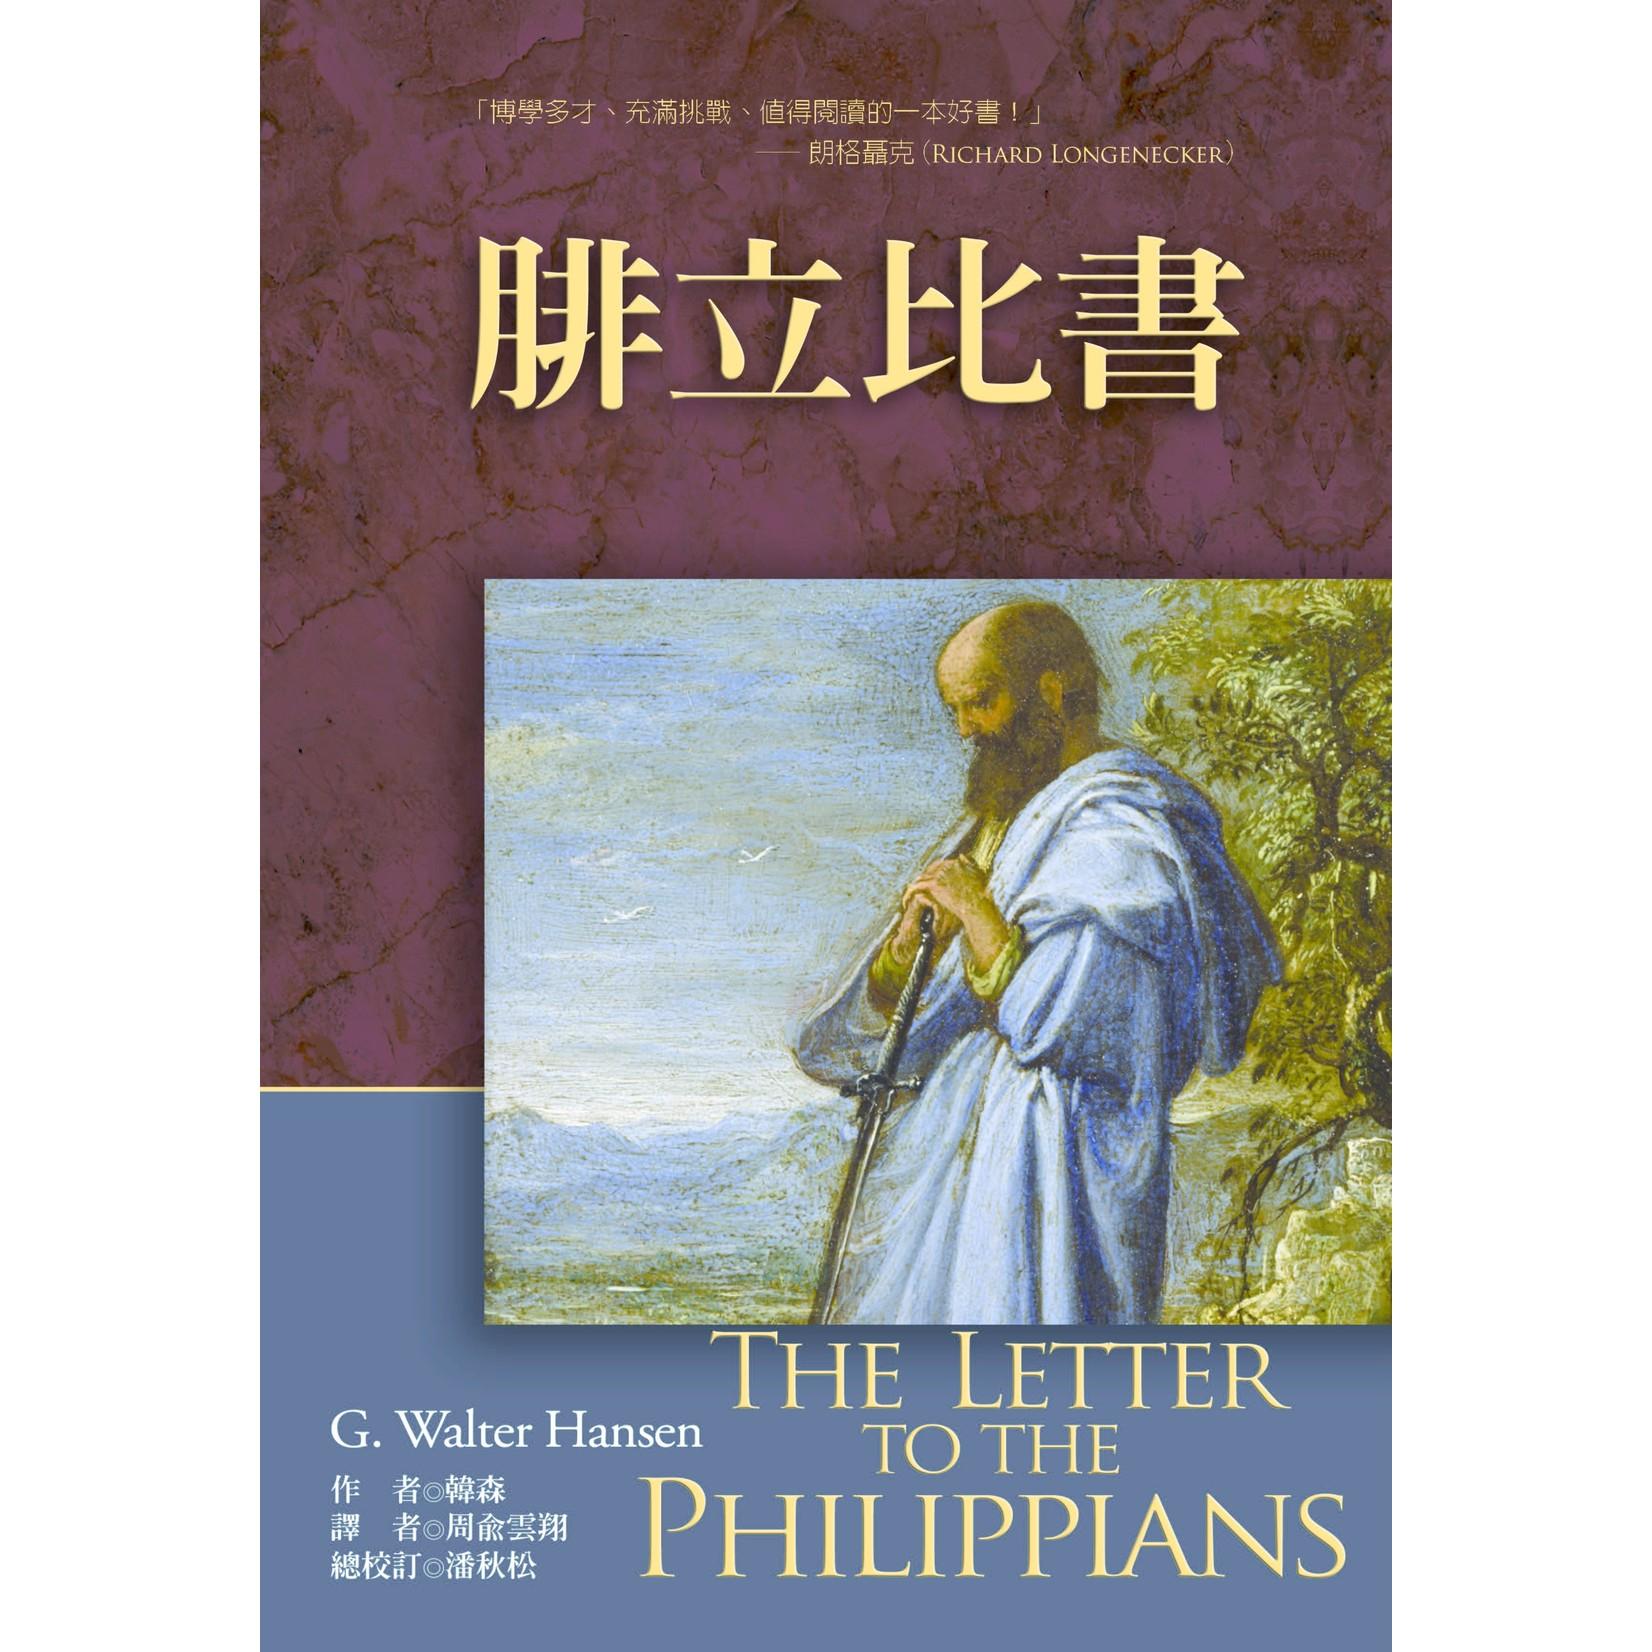 美國麥種傳道會 AKOWCM 麥種聖經註釋:腓立比書 The Letter To The Philippians